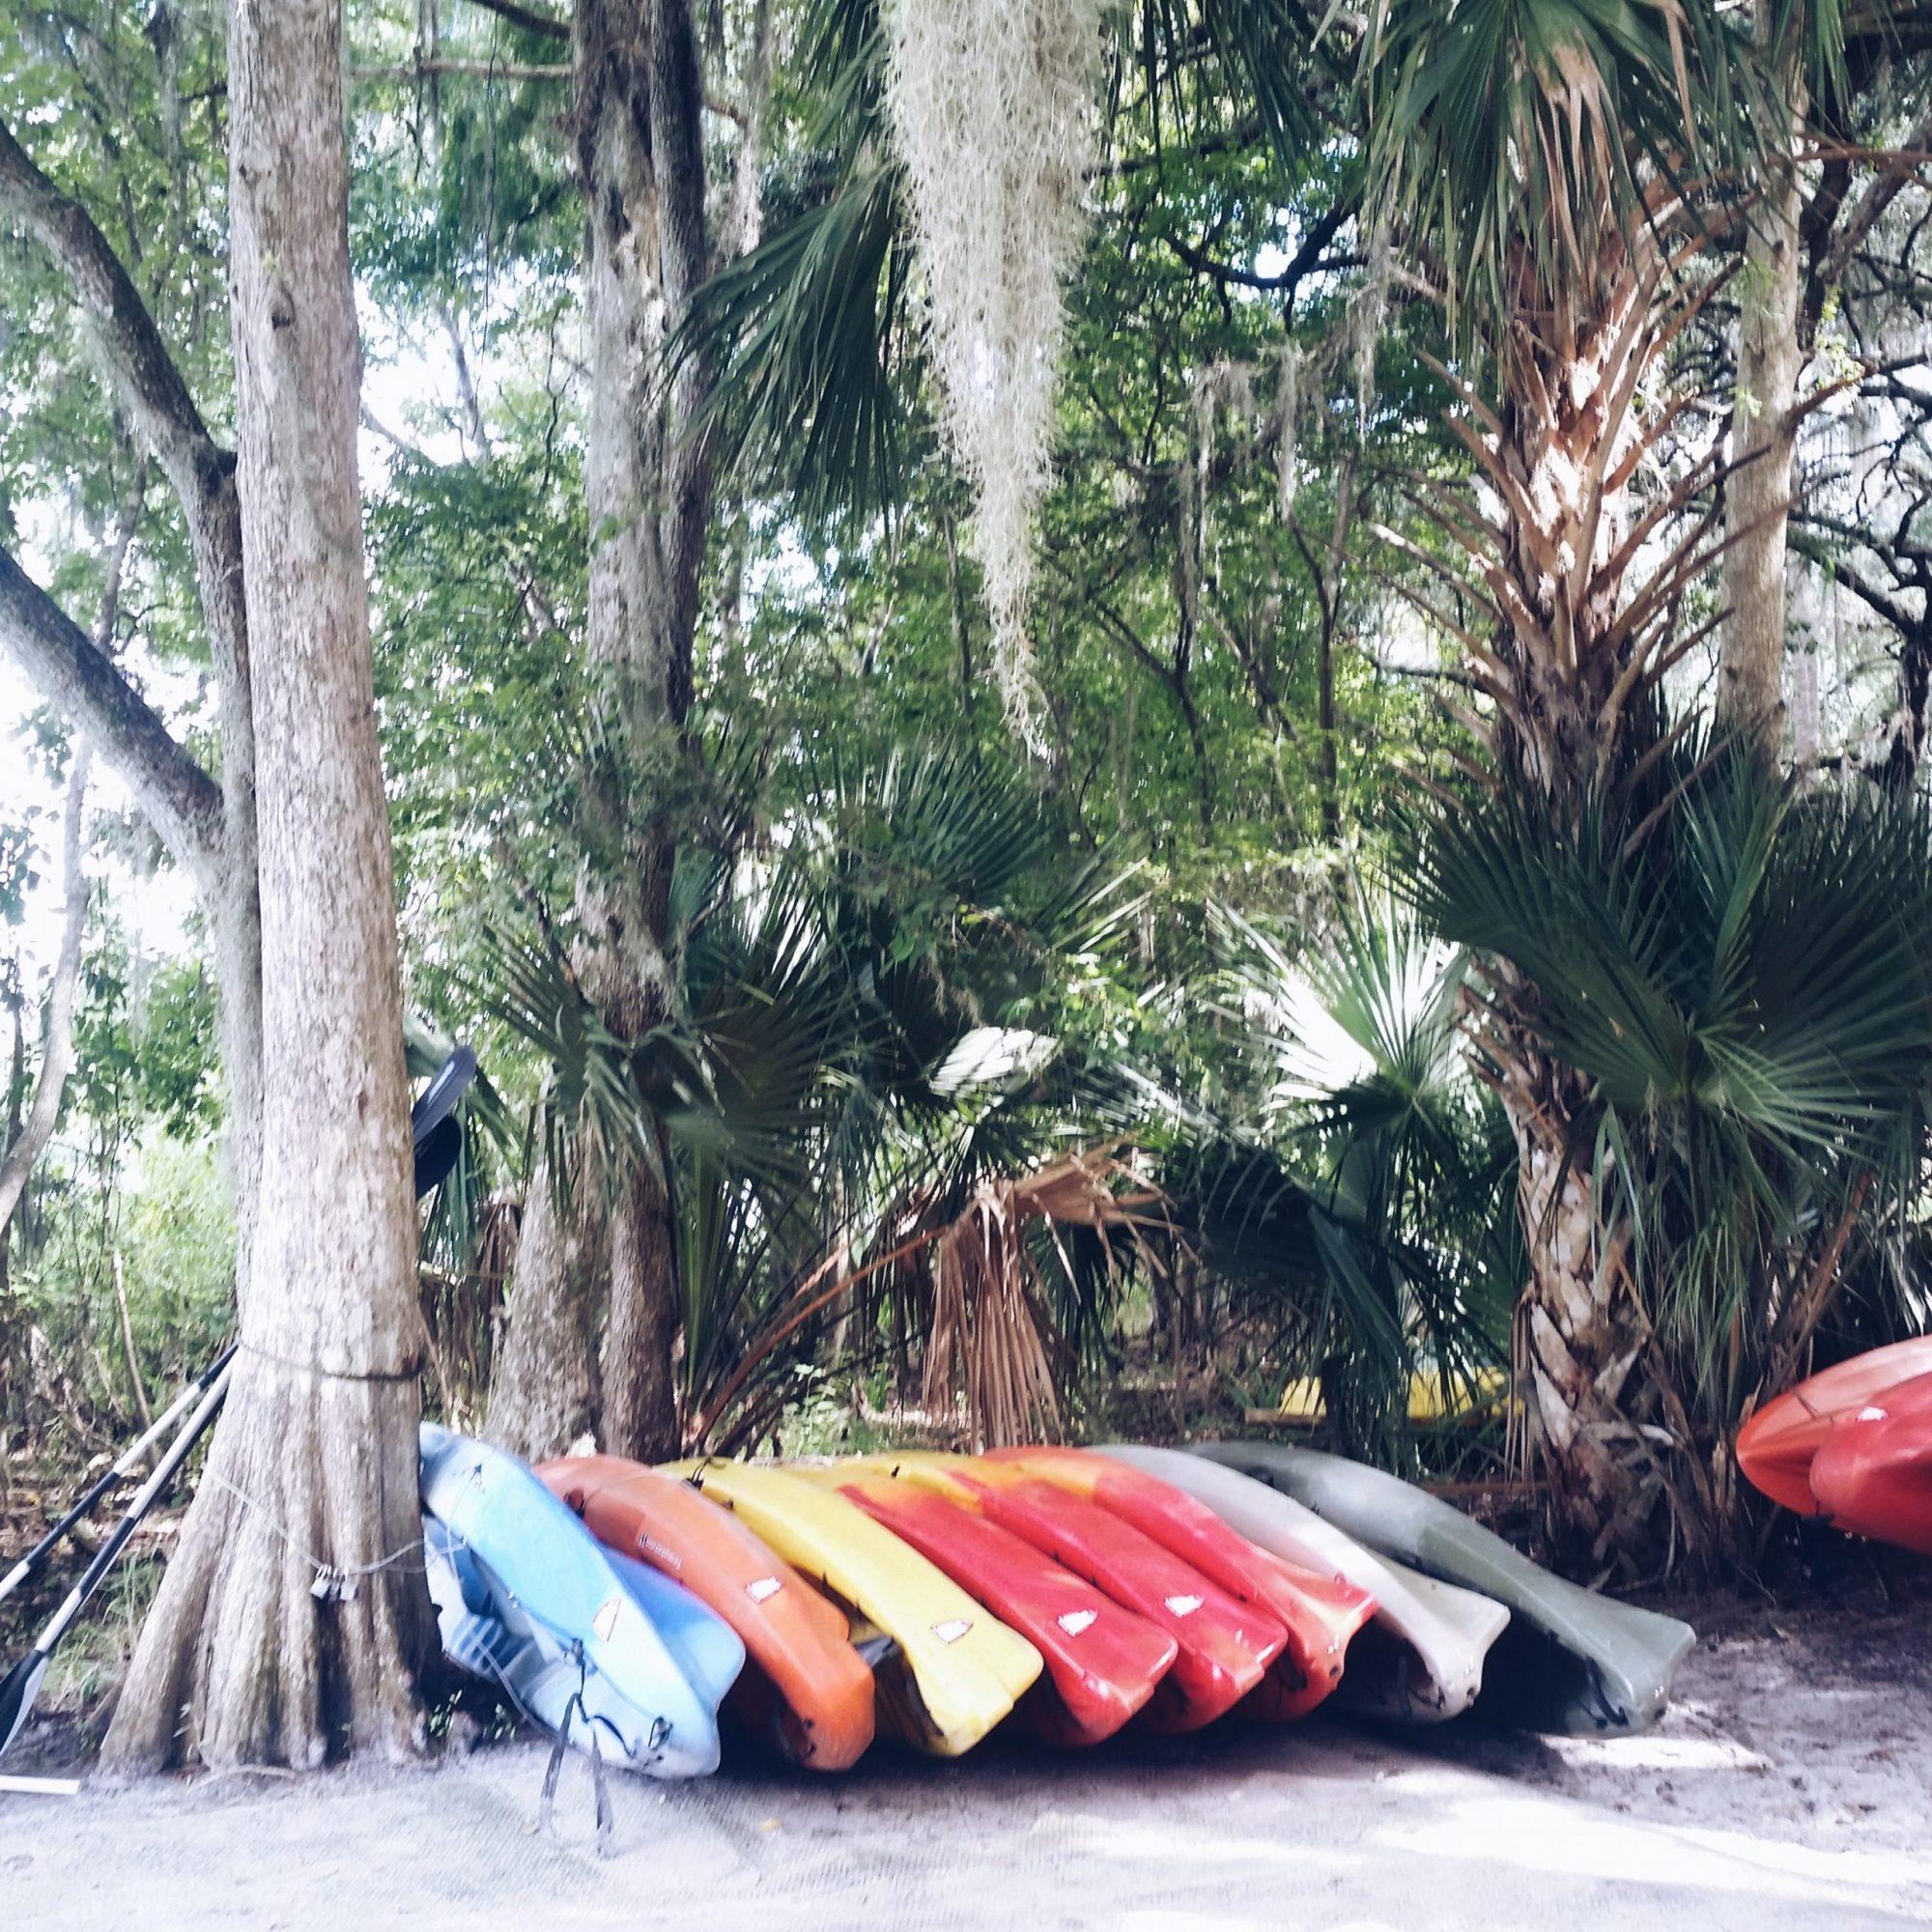 Canoe Rental at Blue Spring State Park